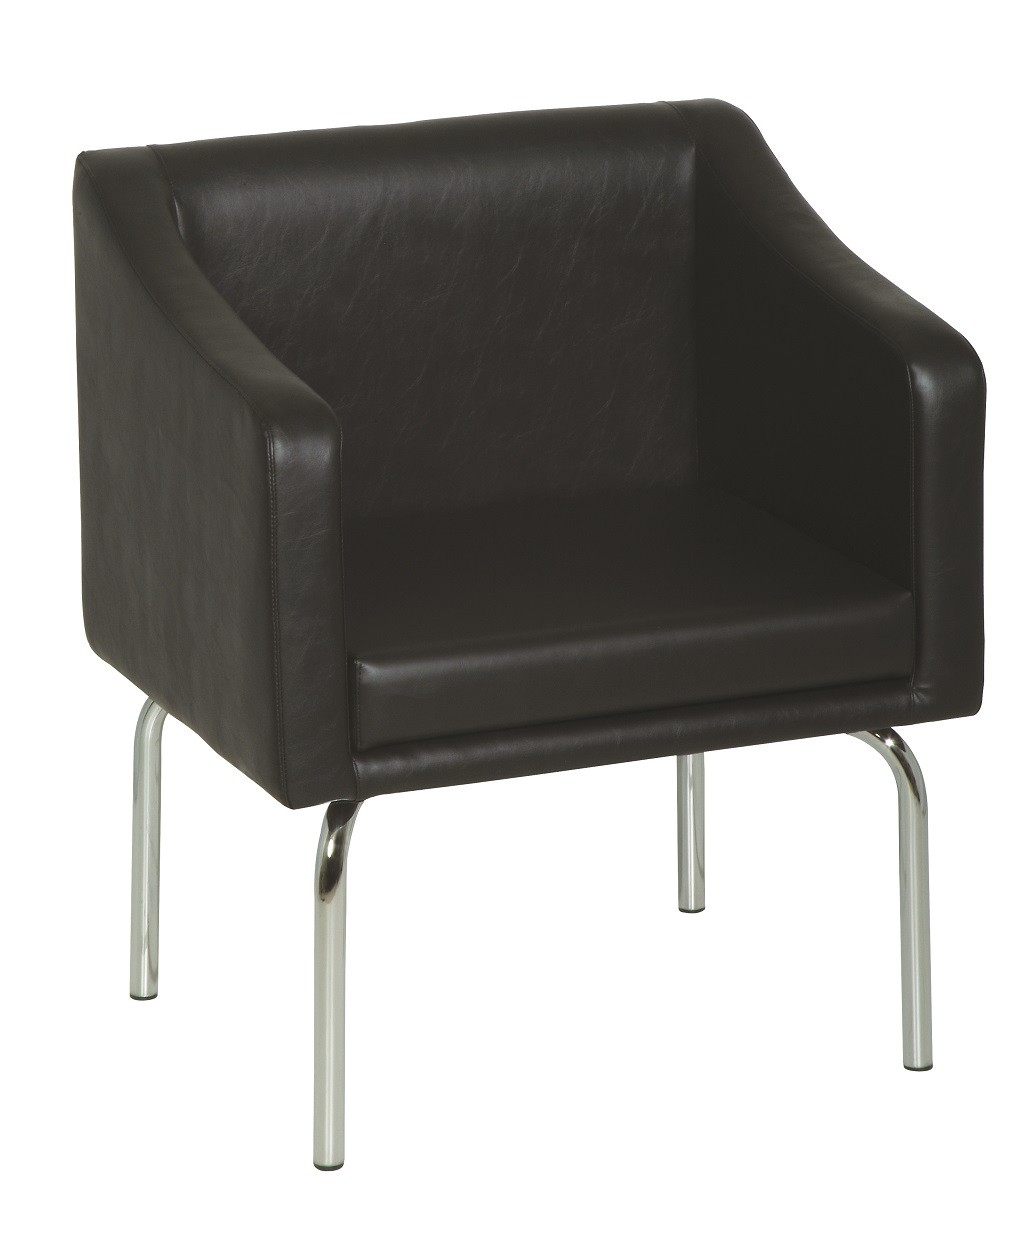 Belvedere LK19 Look Reception Chair